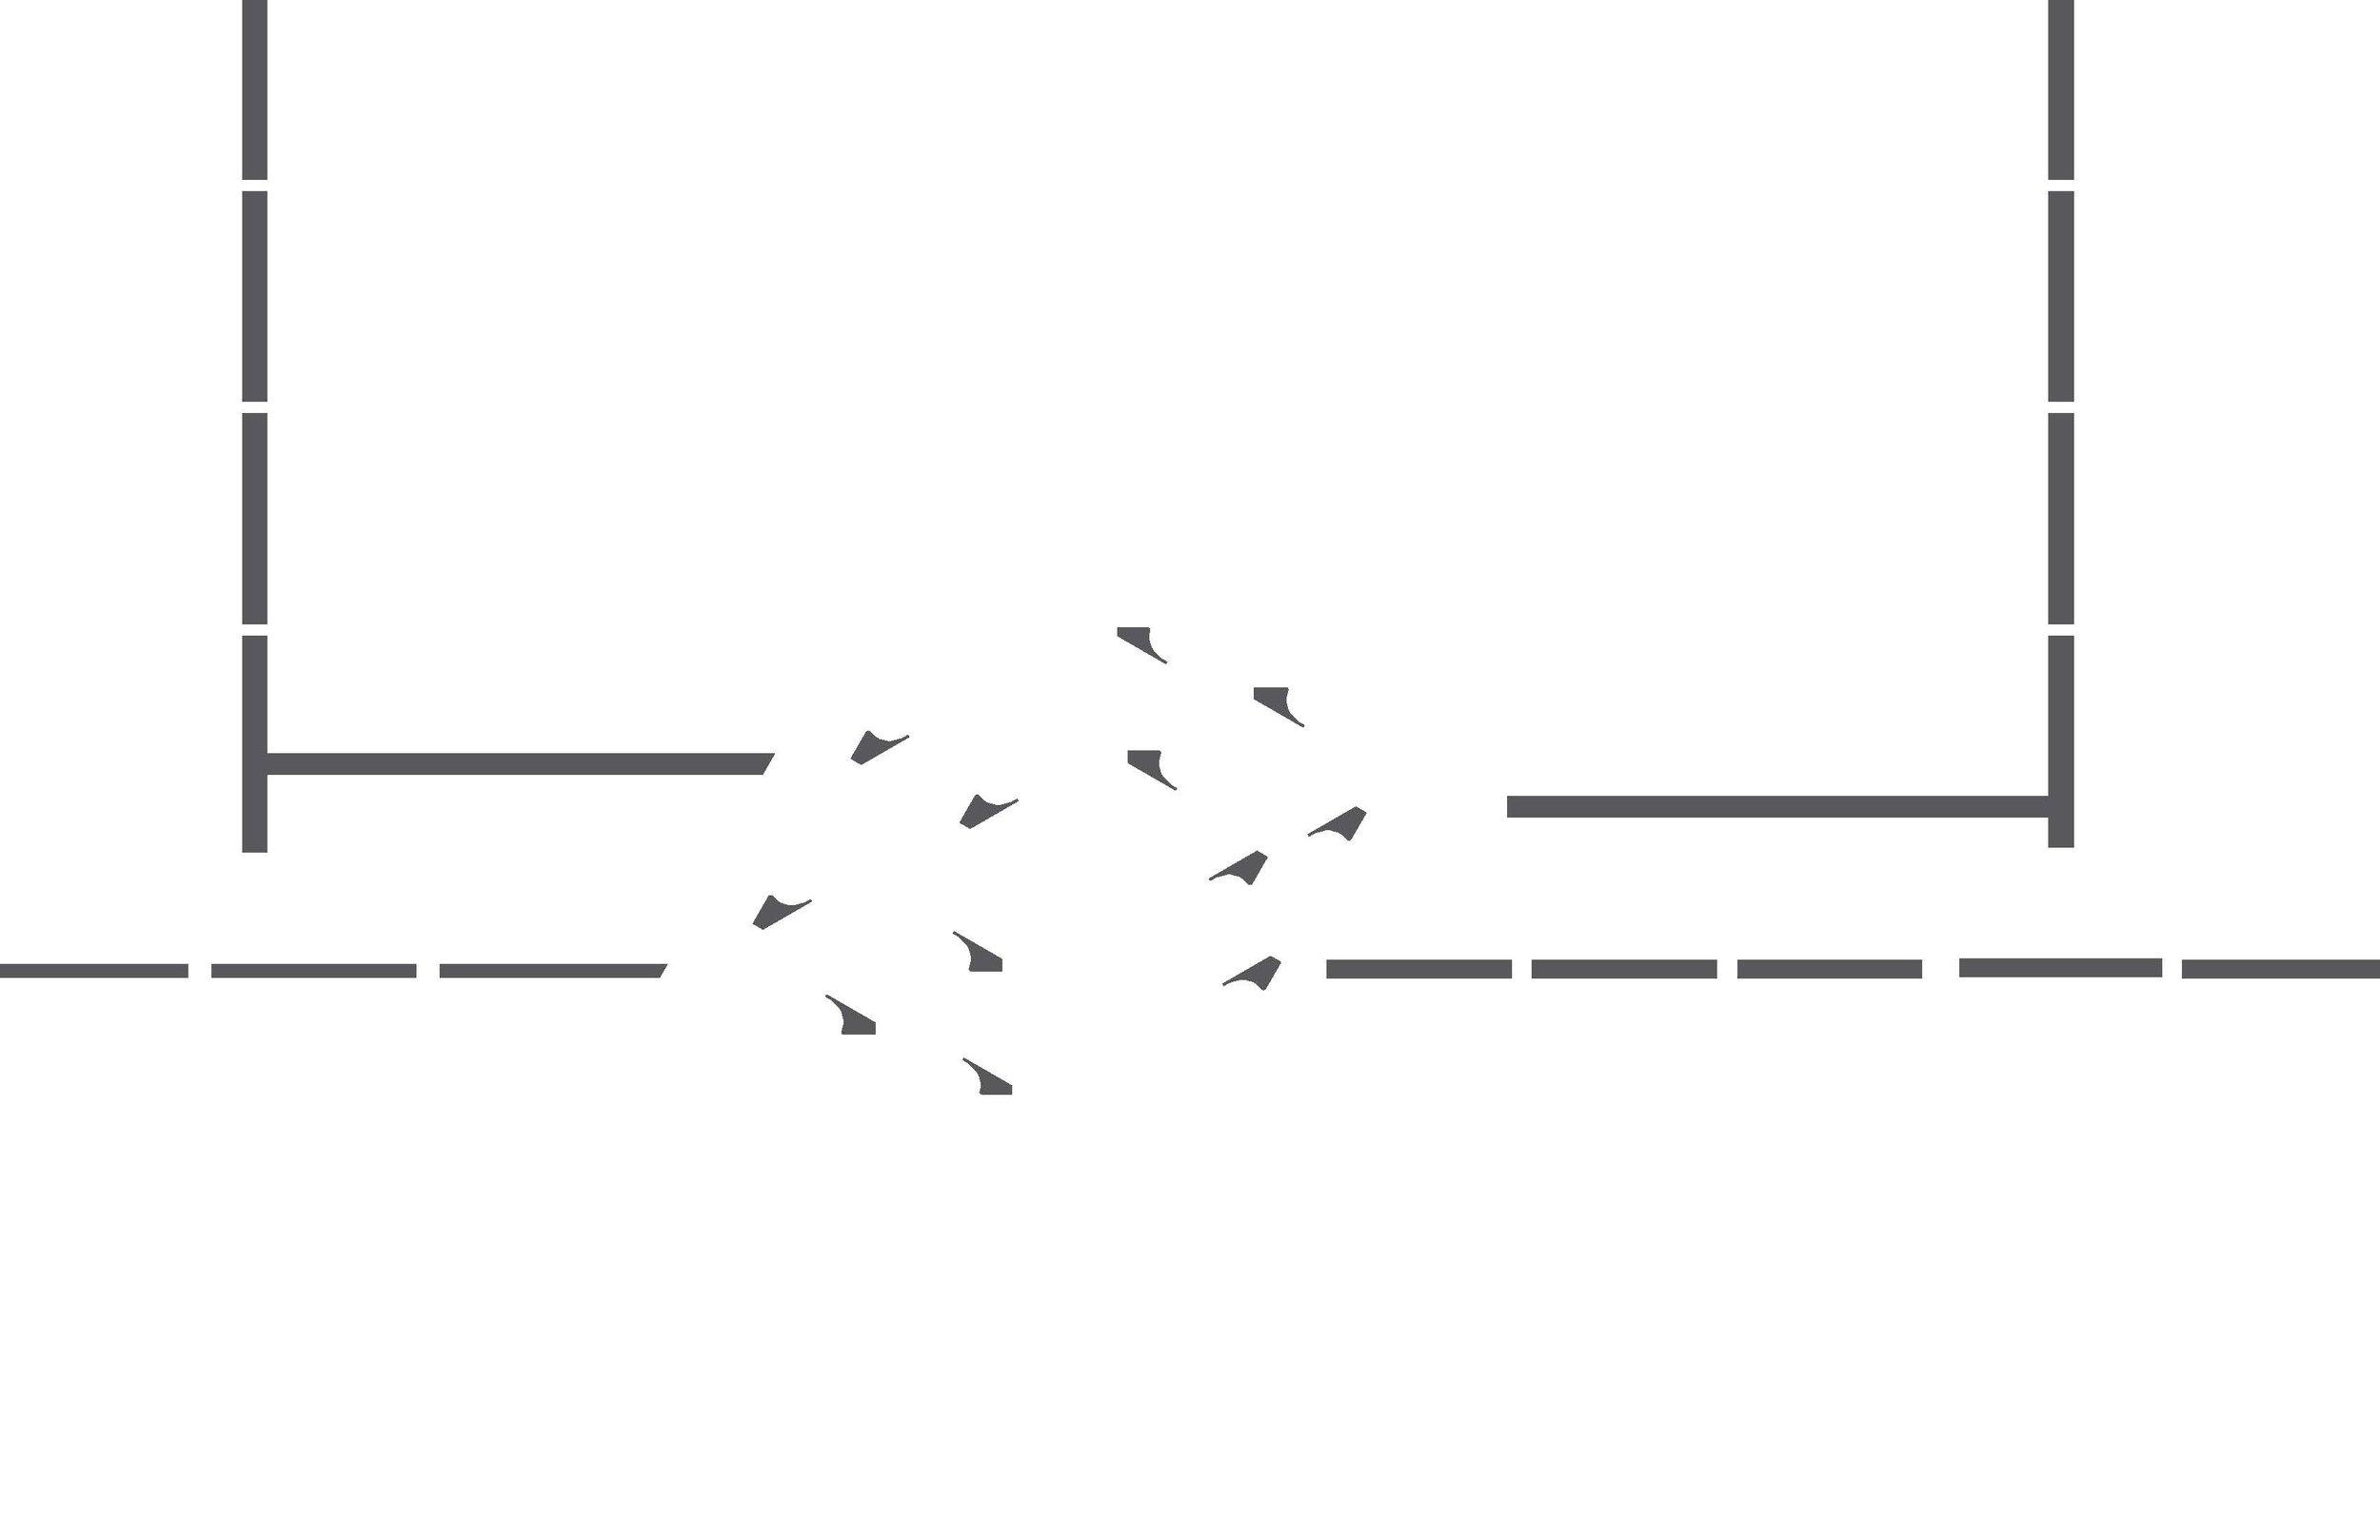 Pedestrian circulation